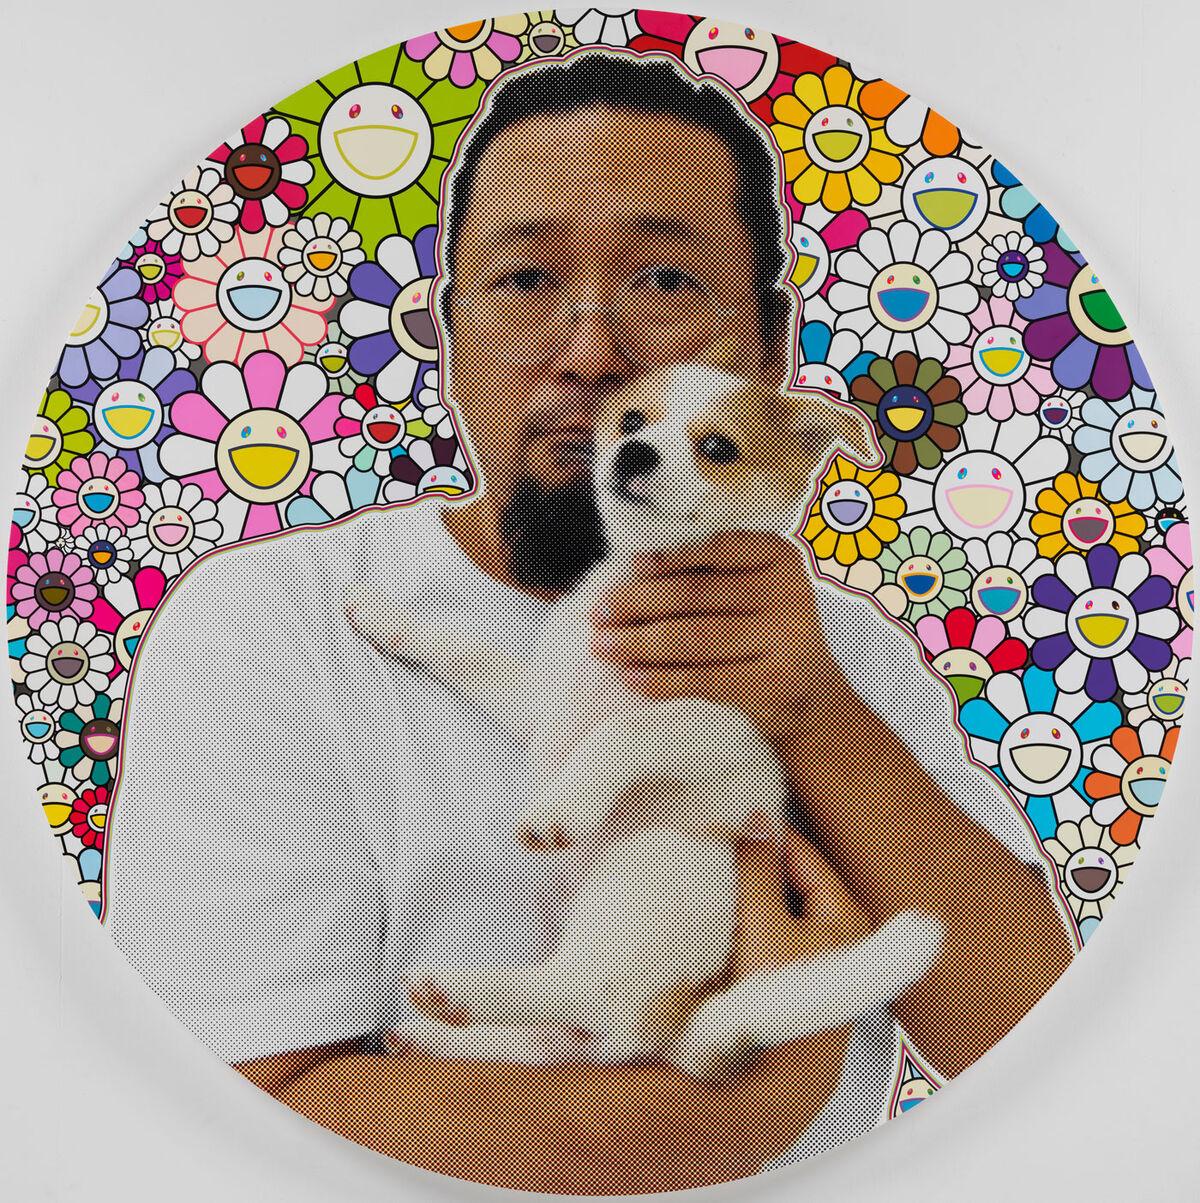 Takashi Murakami, In 2019, a Sentimental Memory of POM and Me, 2019. ©︎ 2019 Takashi Murakami/Kaikai Kiki Co., Ltd. All Rights Reserved. Courtesy of Gagosian.